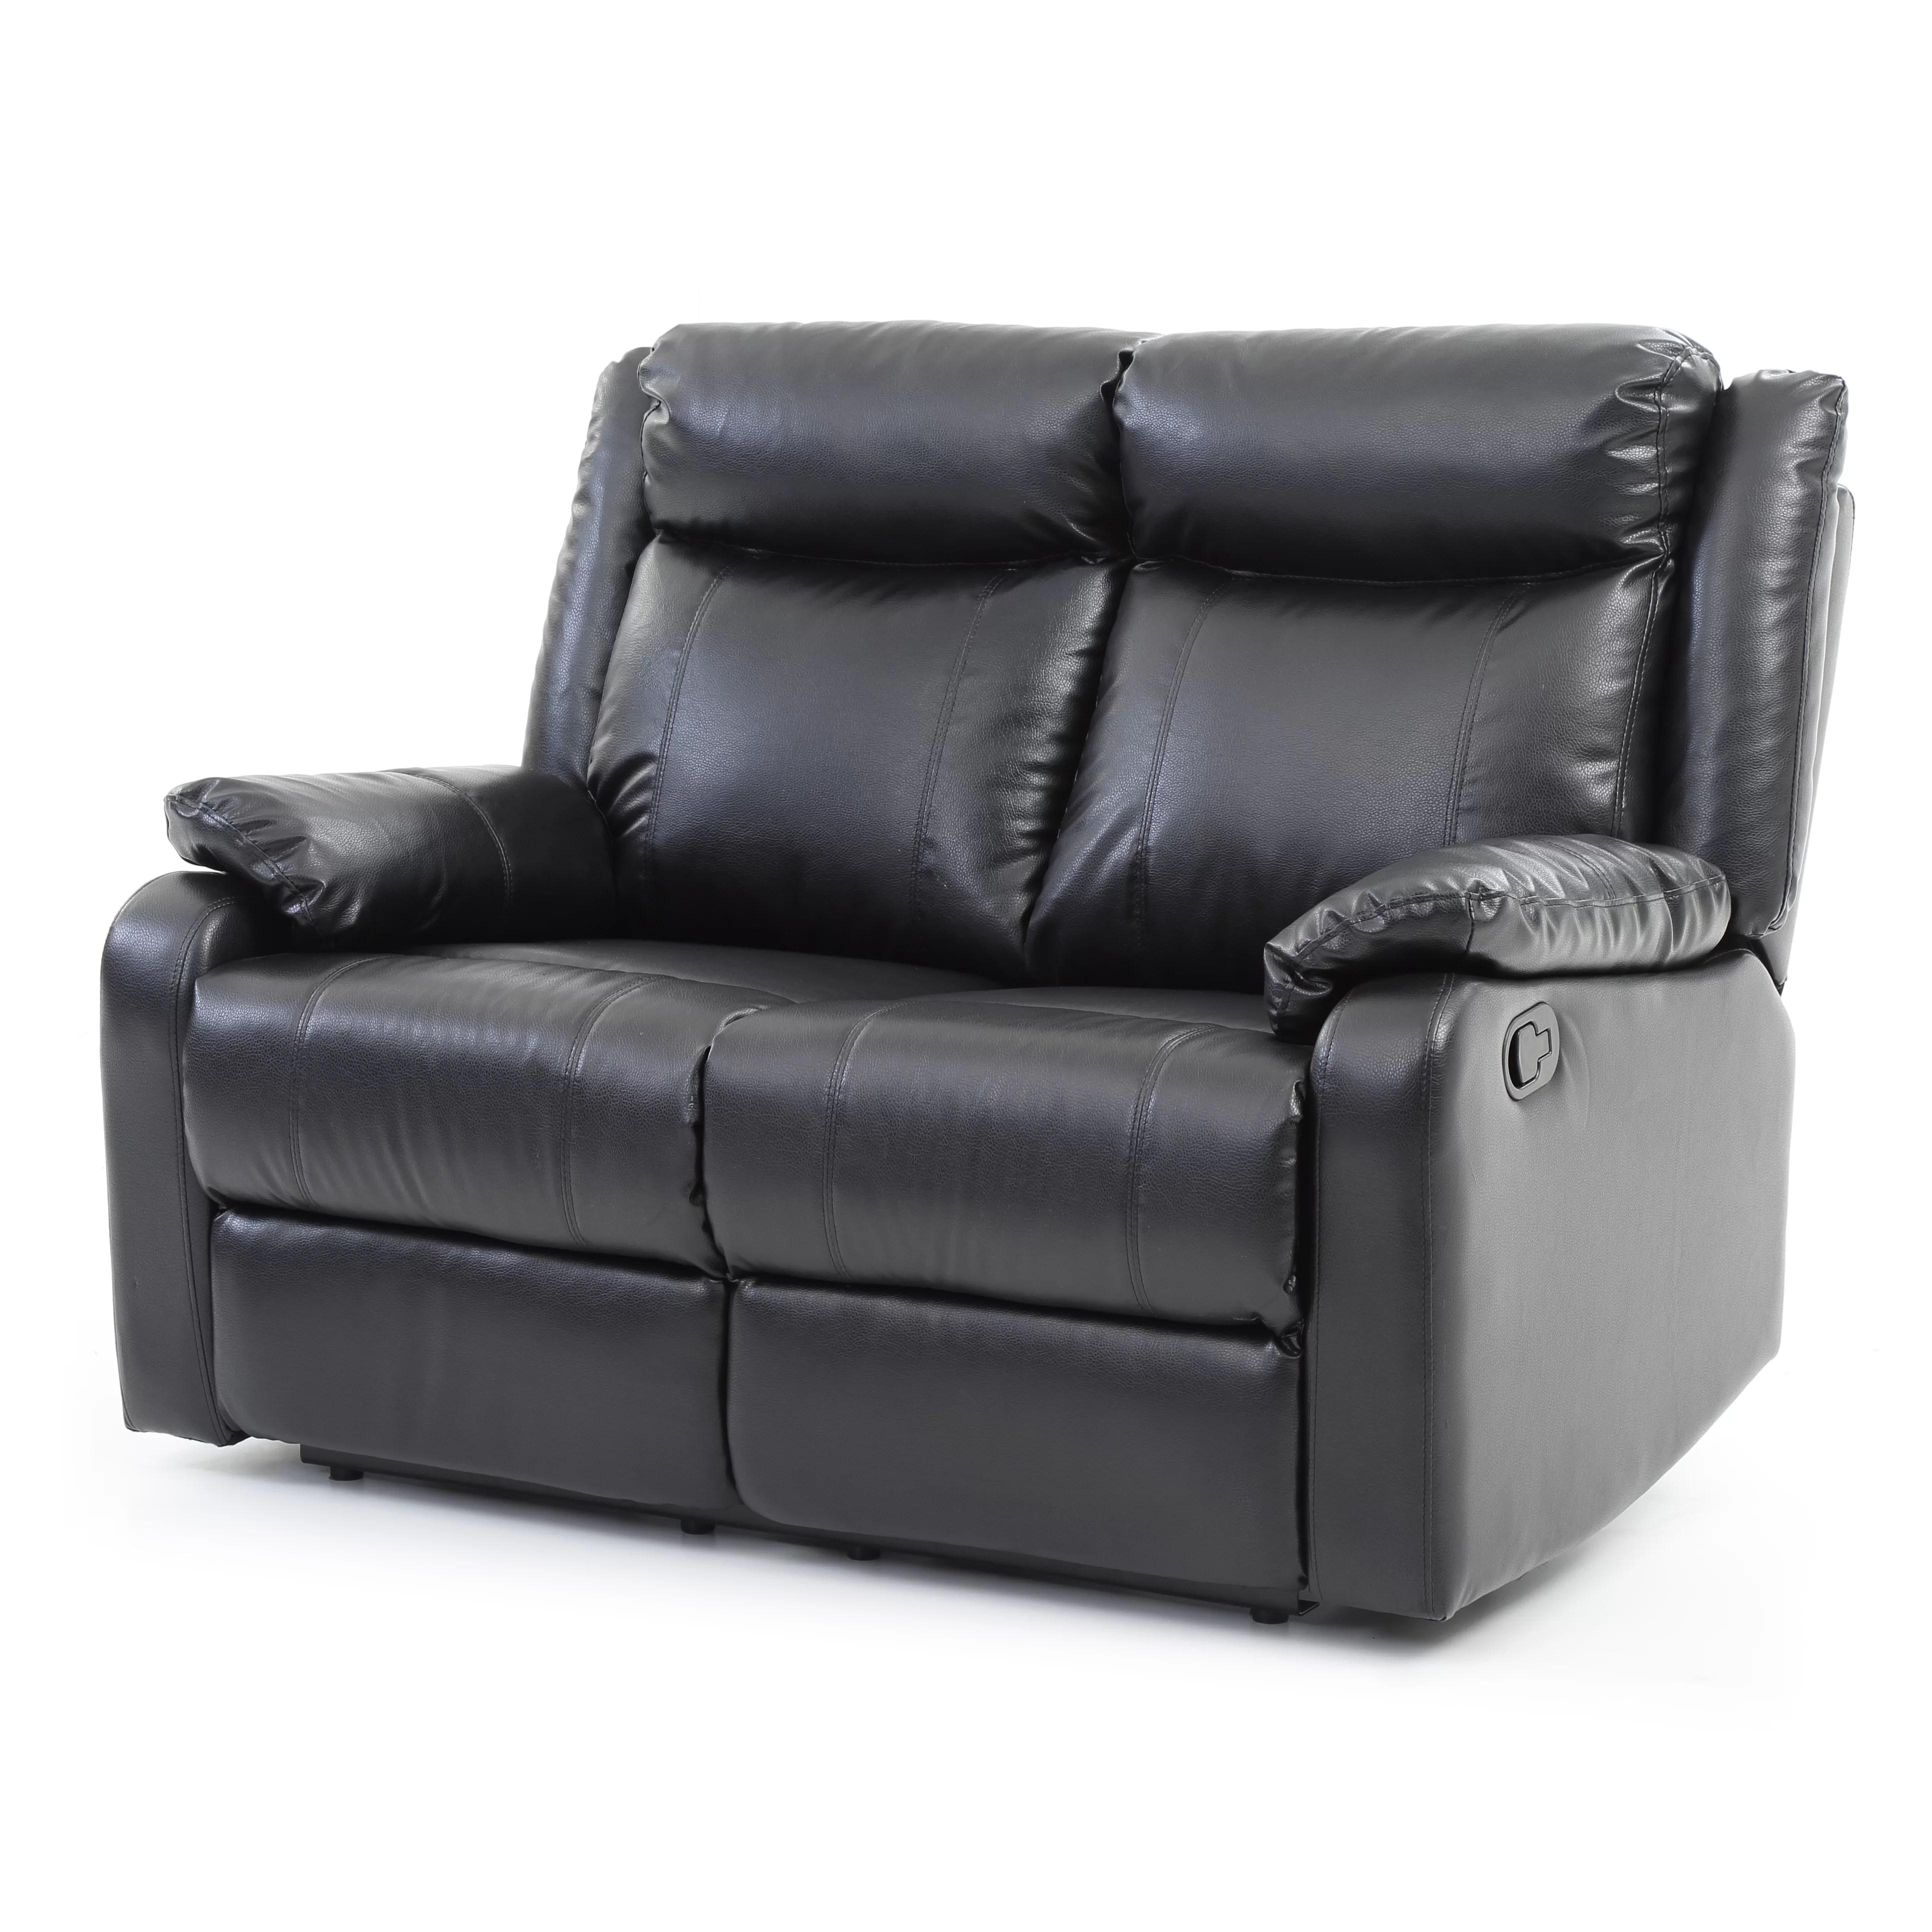 double reclining leather sofa small velvet glory furniture boston loveseat